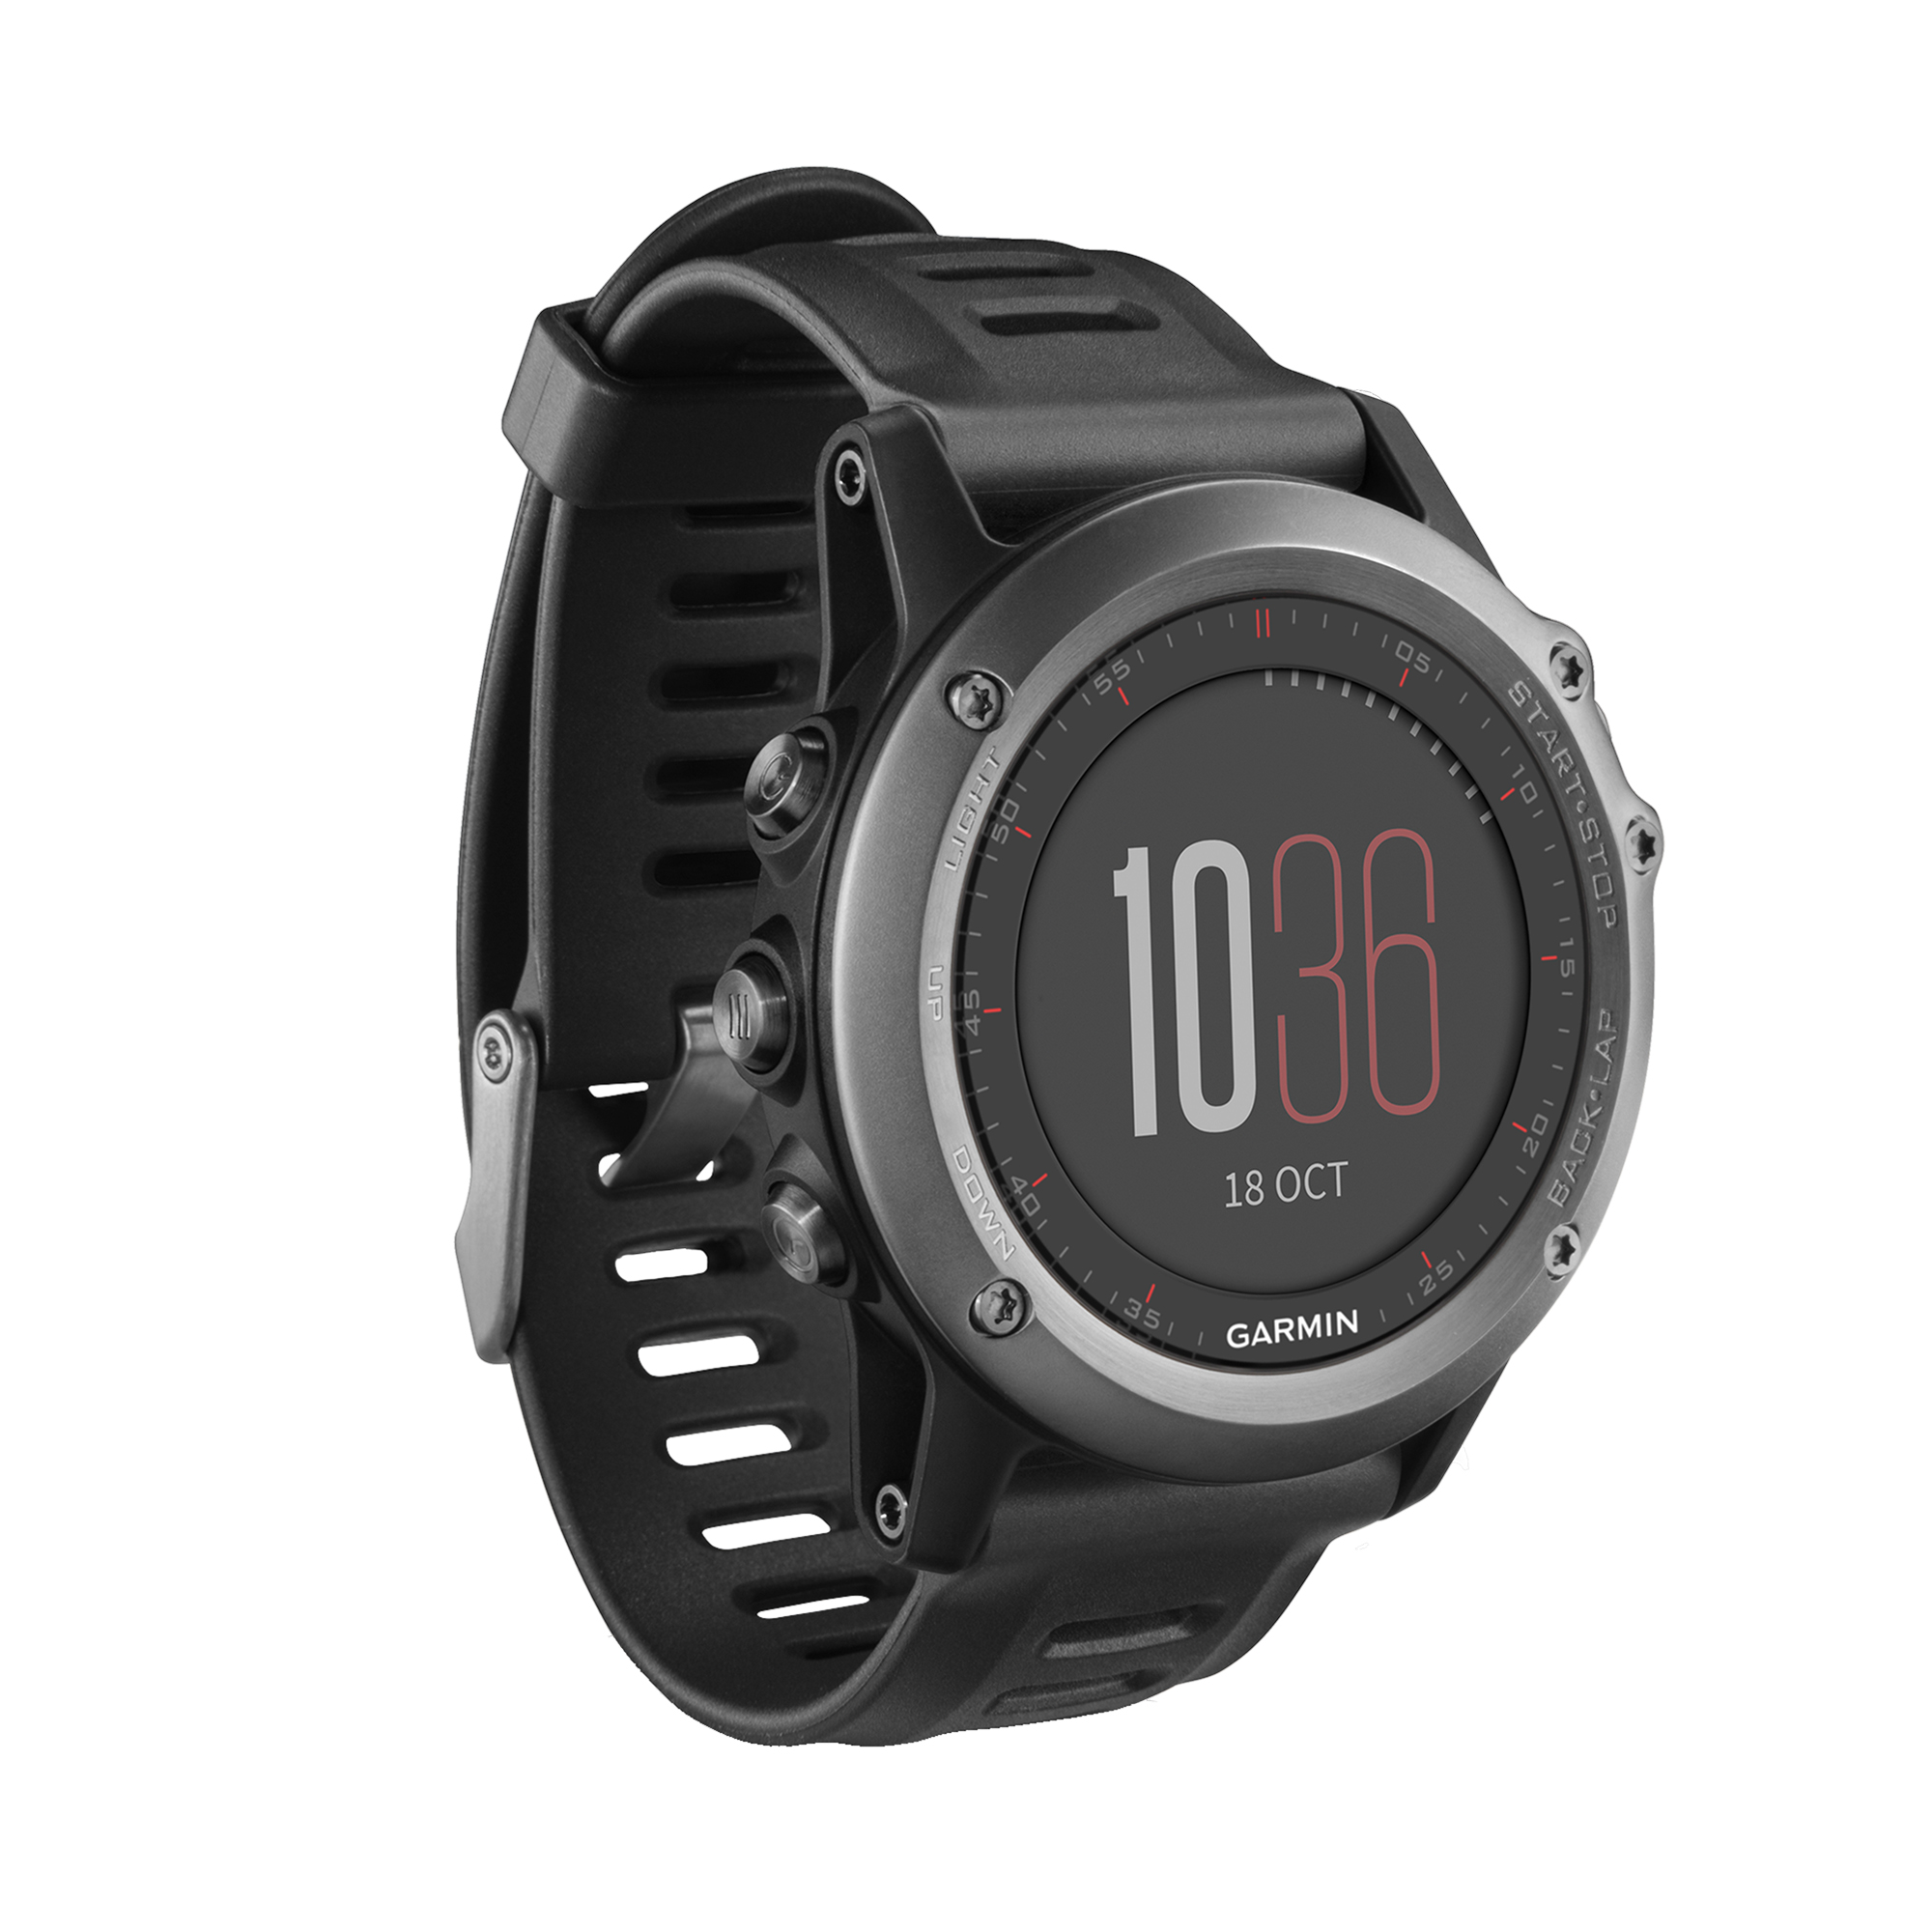 Garmin Fenix 3 Smart Multi Sport Fitness Tracker Training Watch with GPS, Gray by Garmin